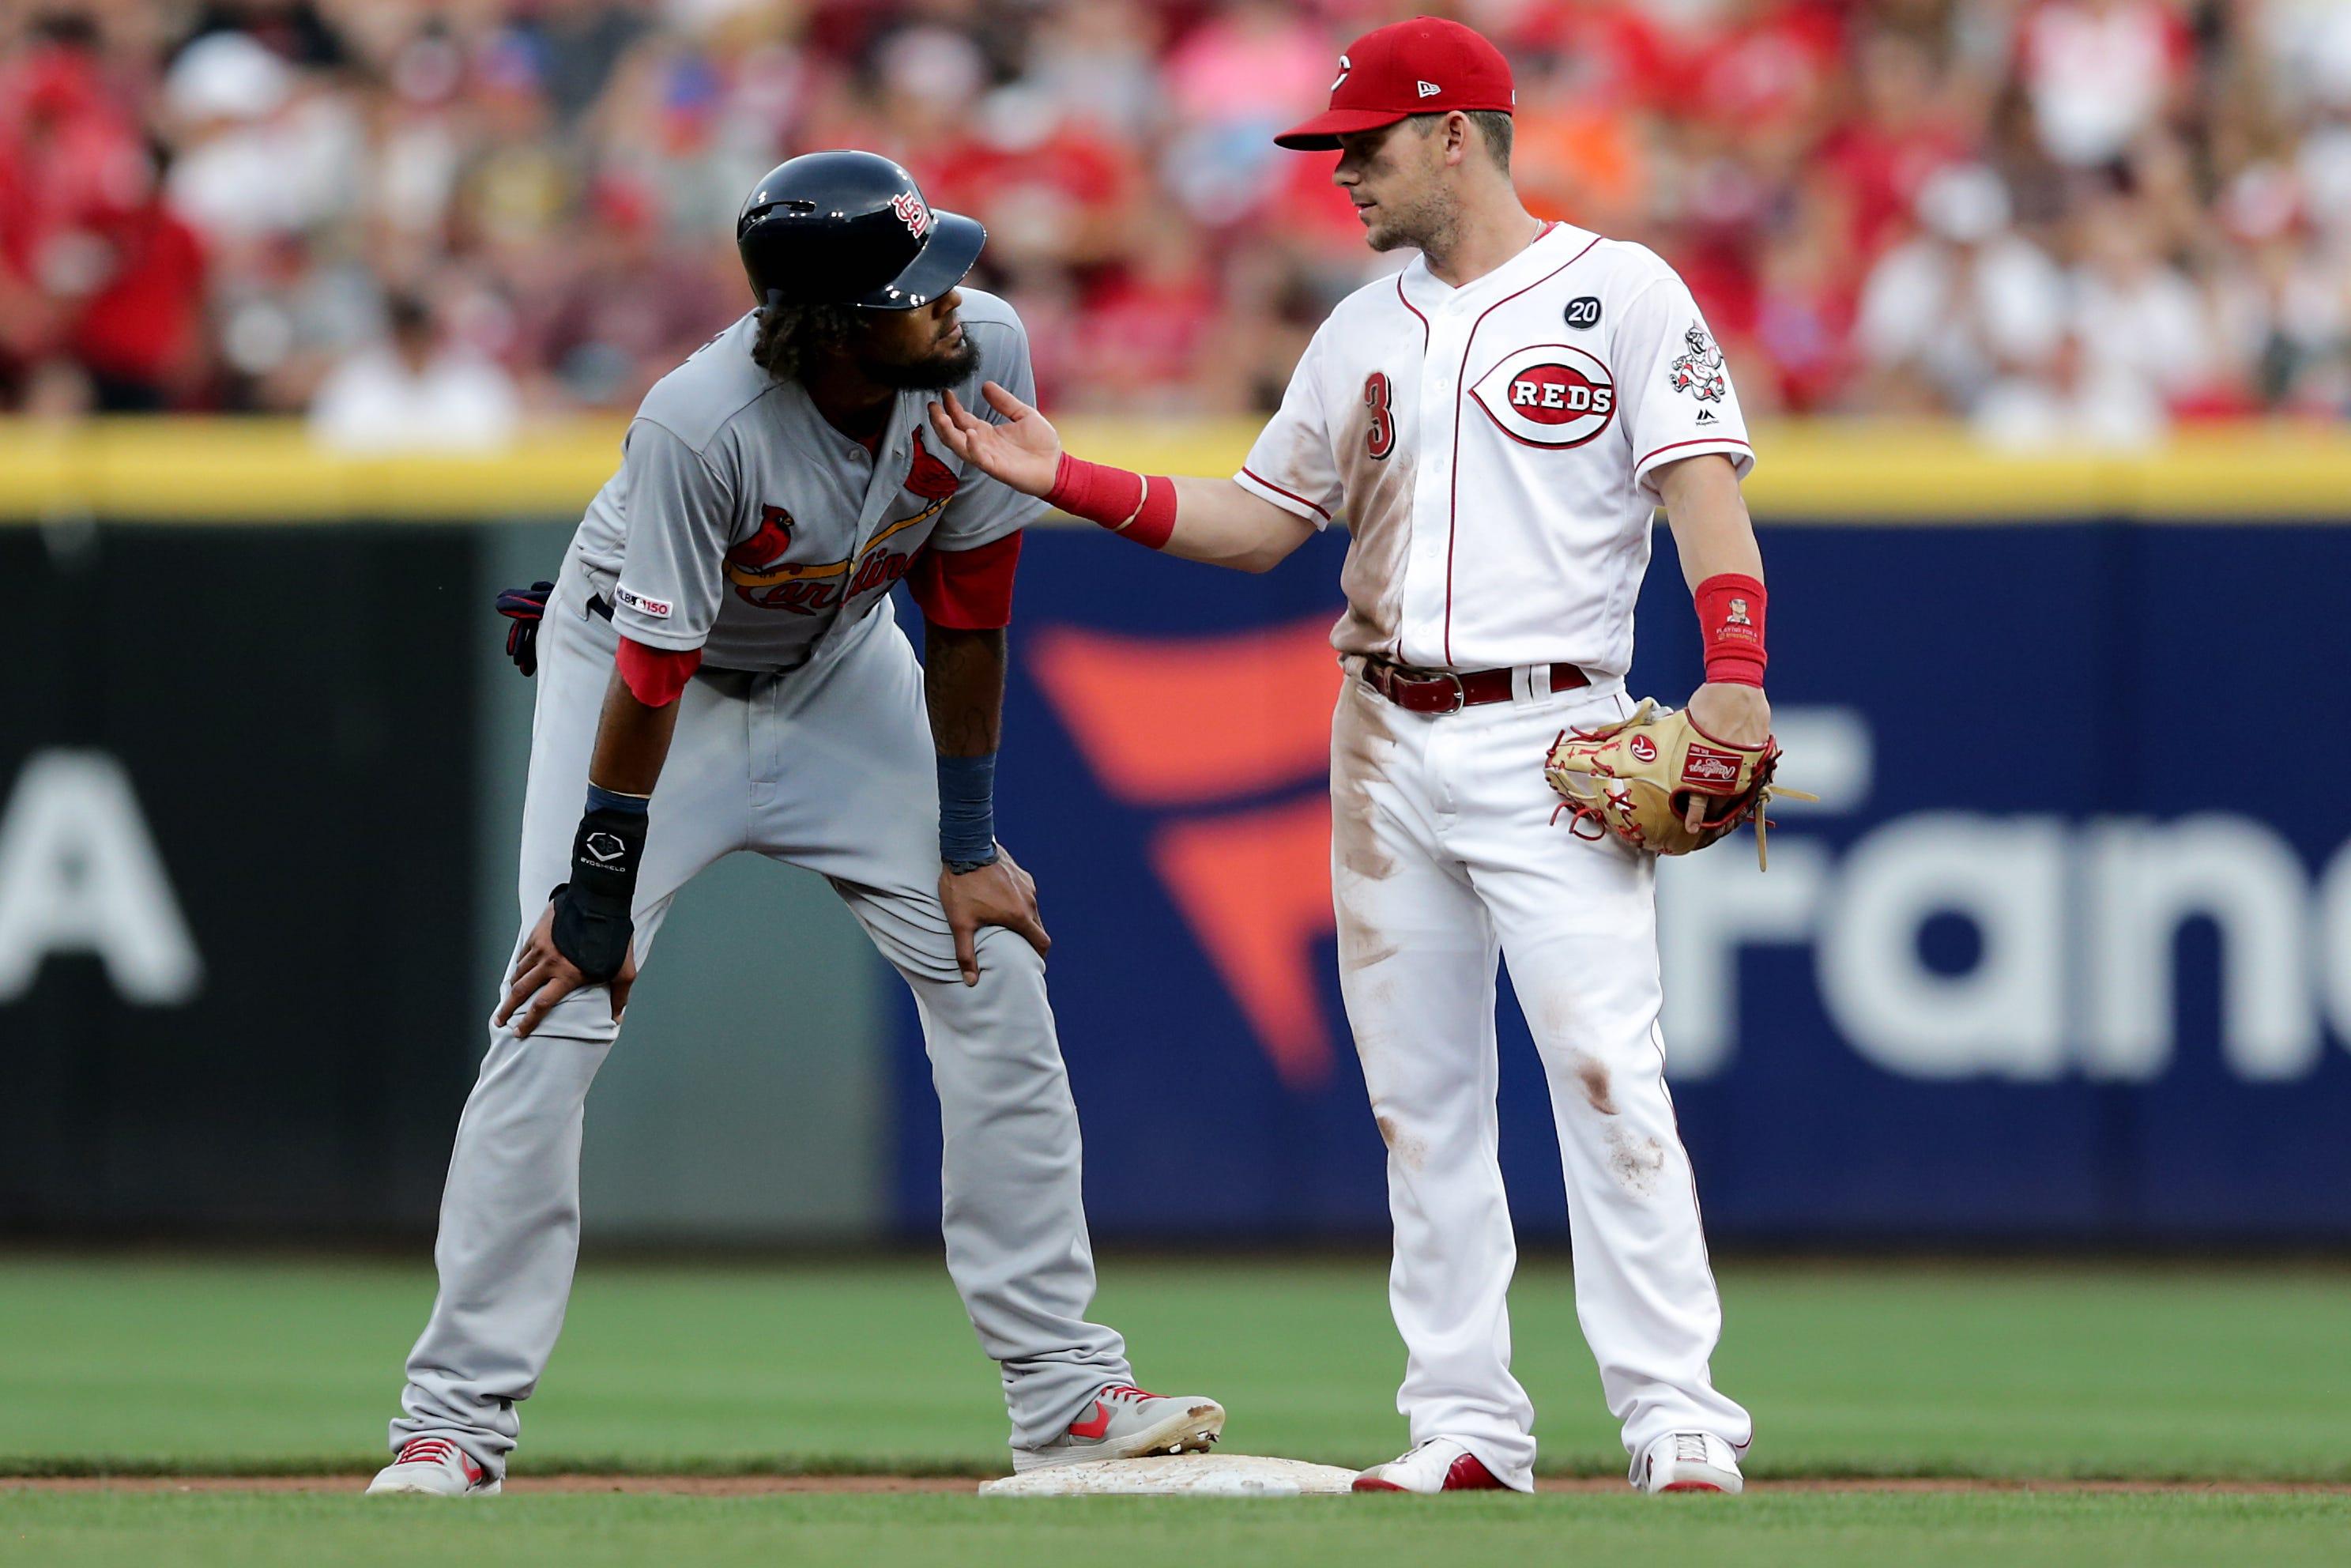 GALLERY: St. Louis Cardinals at Cincinnati Reds, July 18